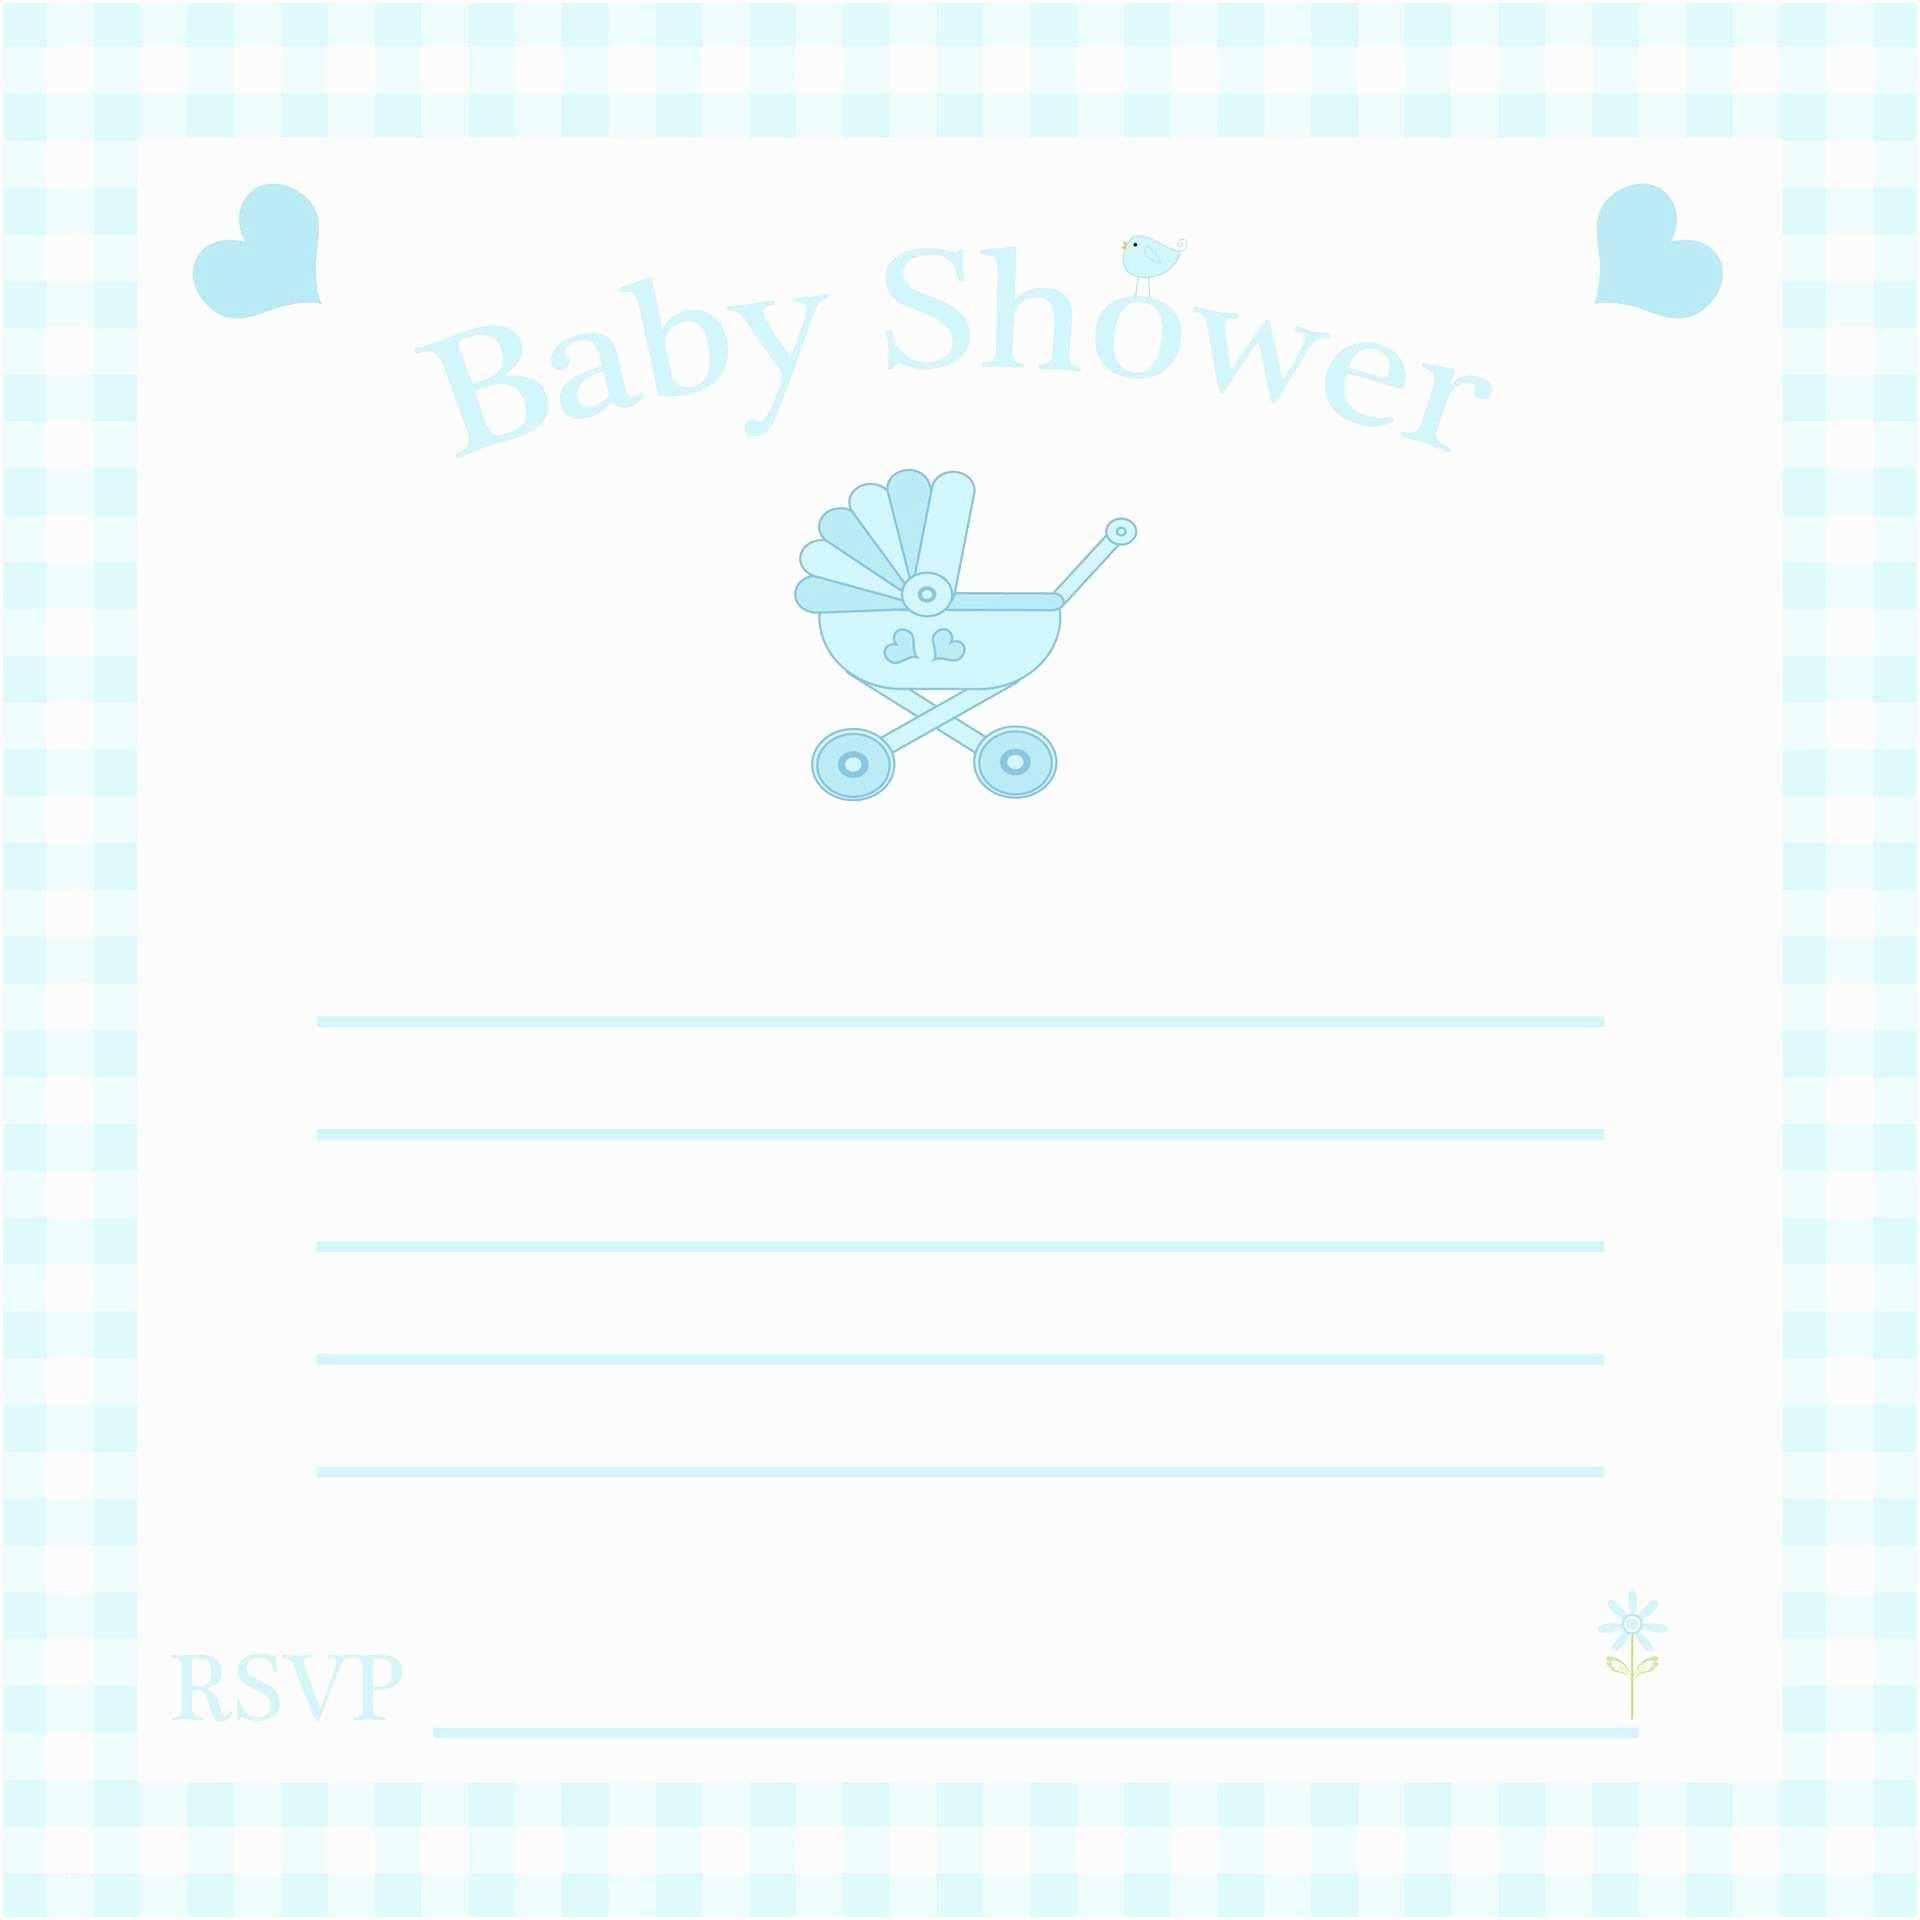 Baby Shower Invitation Templates Graduation Party Free Baby Invitation Template Card